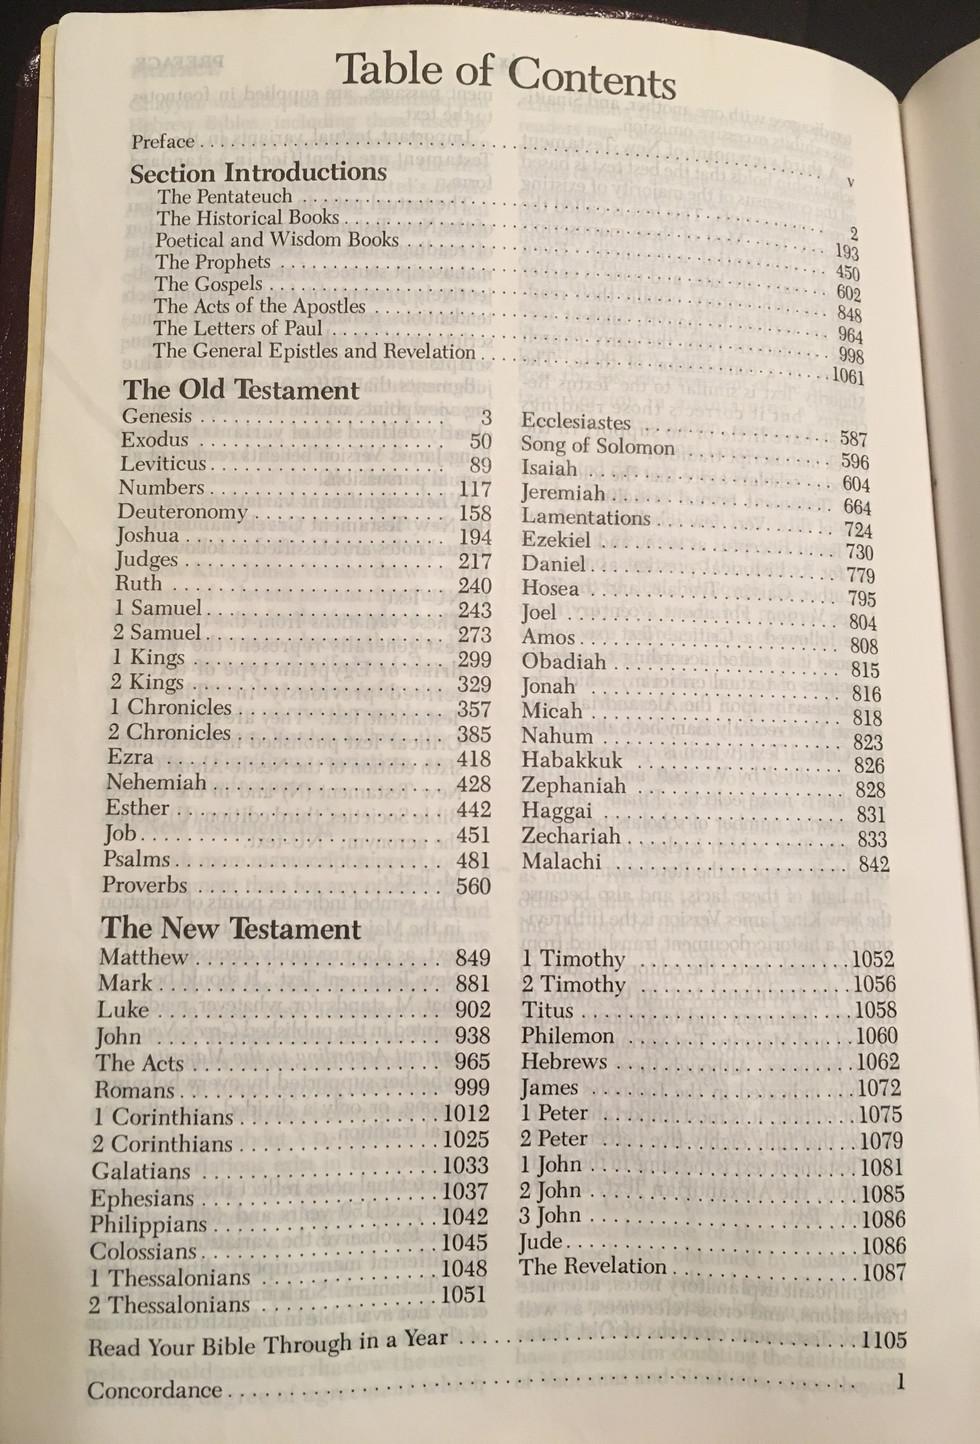 66 Books!